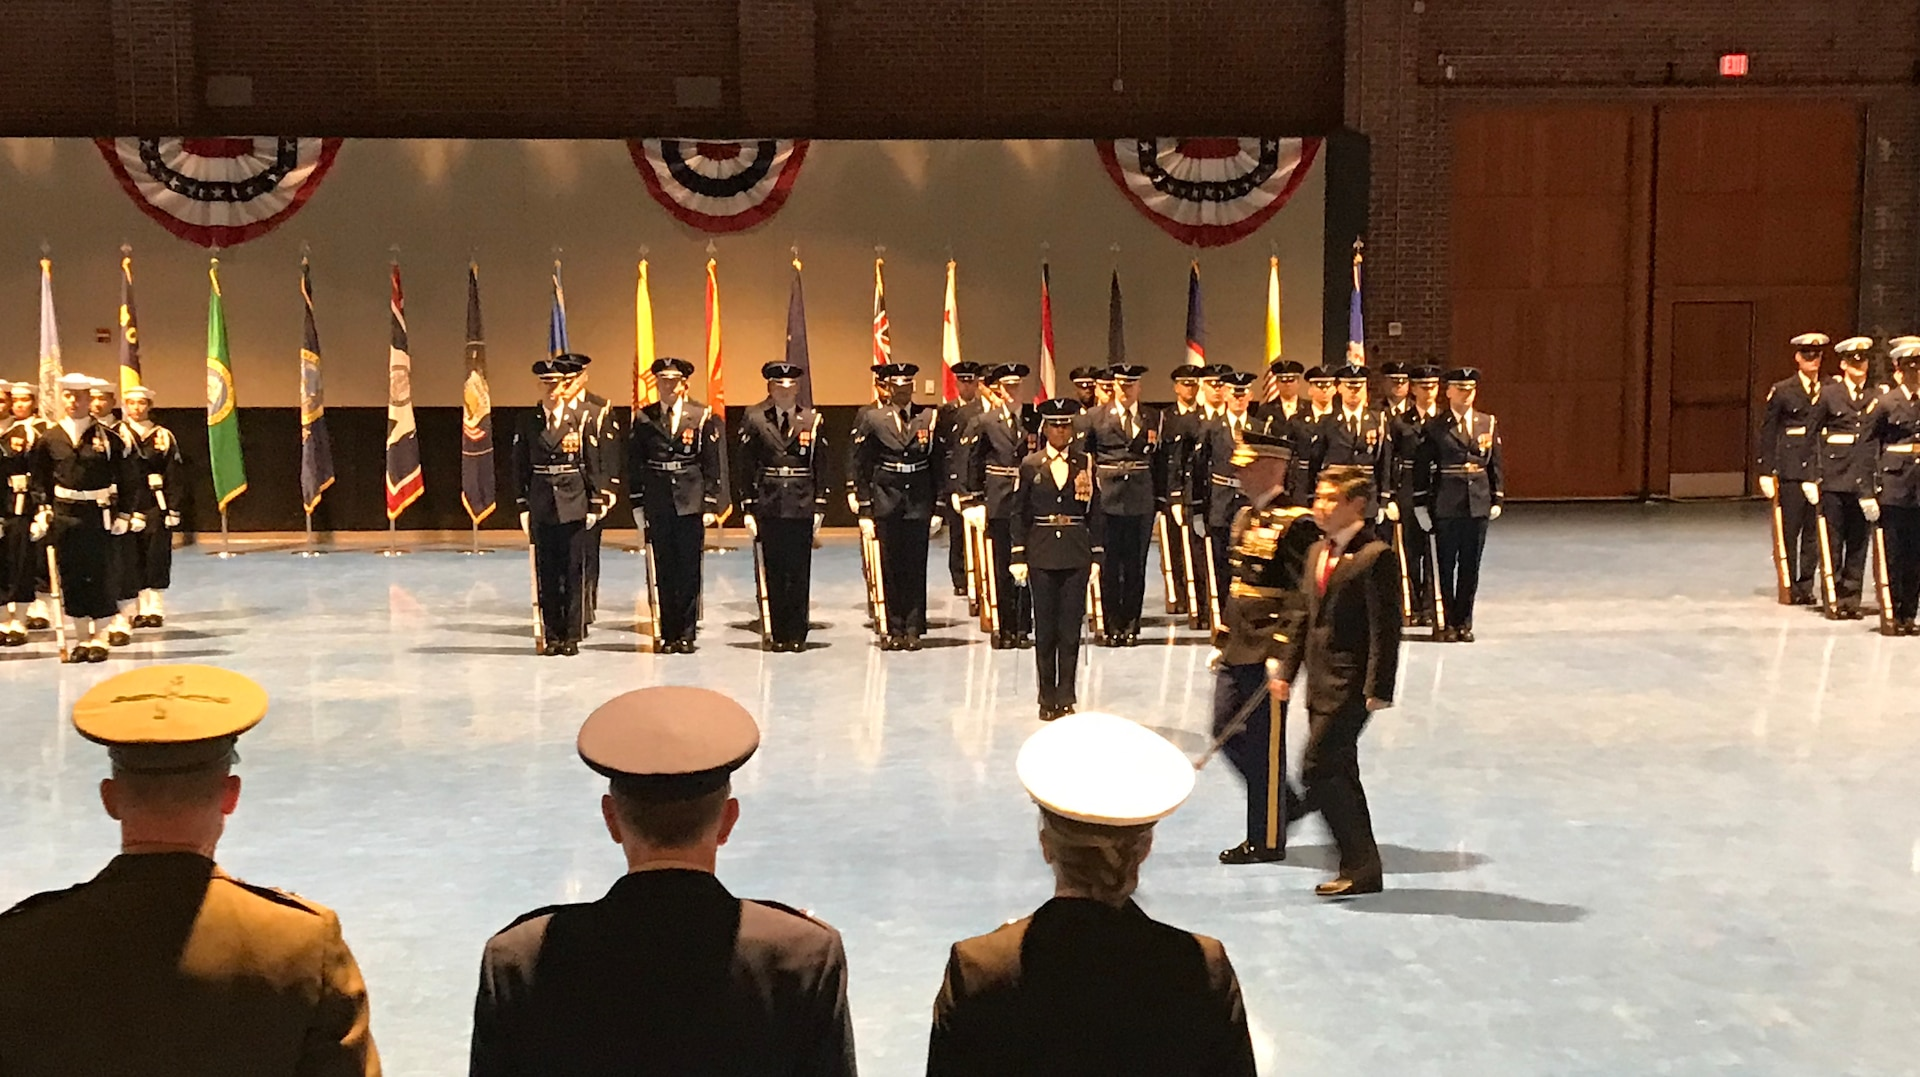 Award to Korean Minister Highlights Strength of U.S.-South Korean Alliance